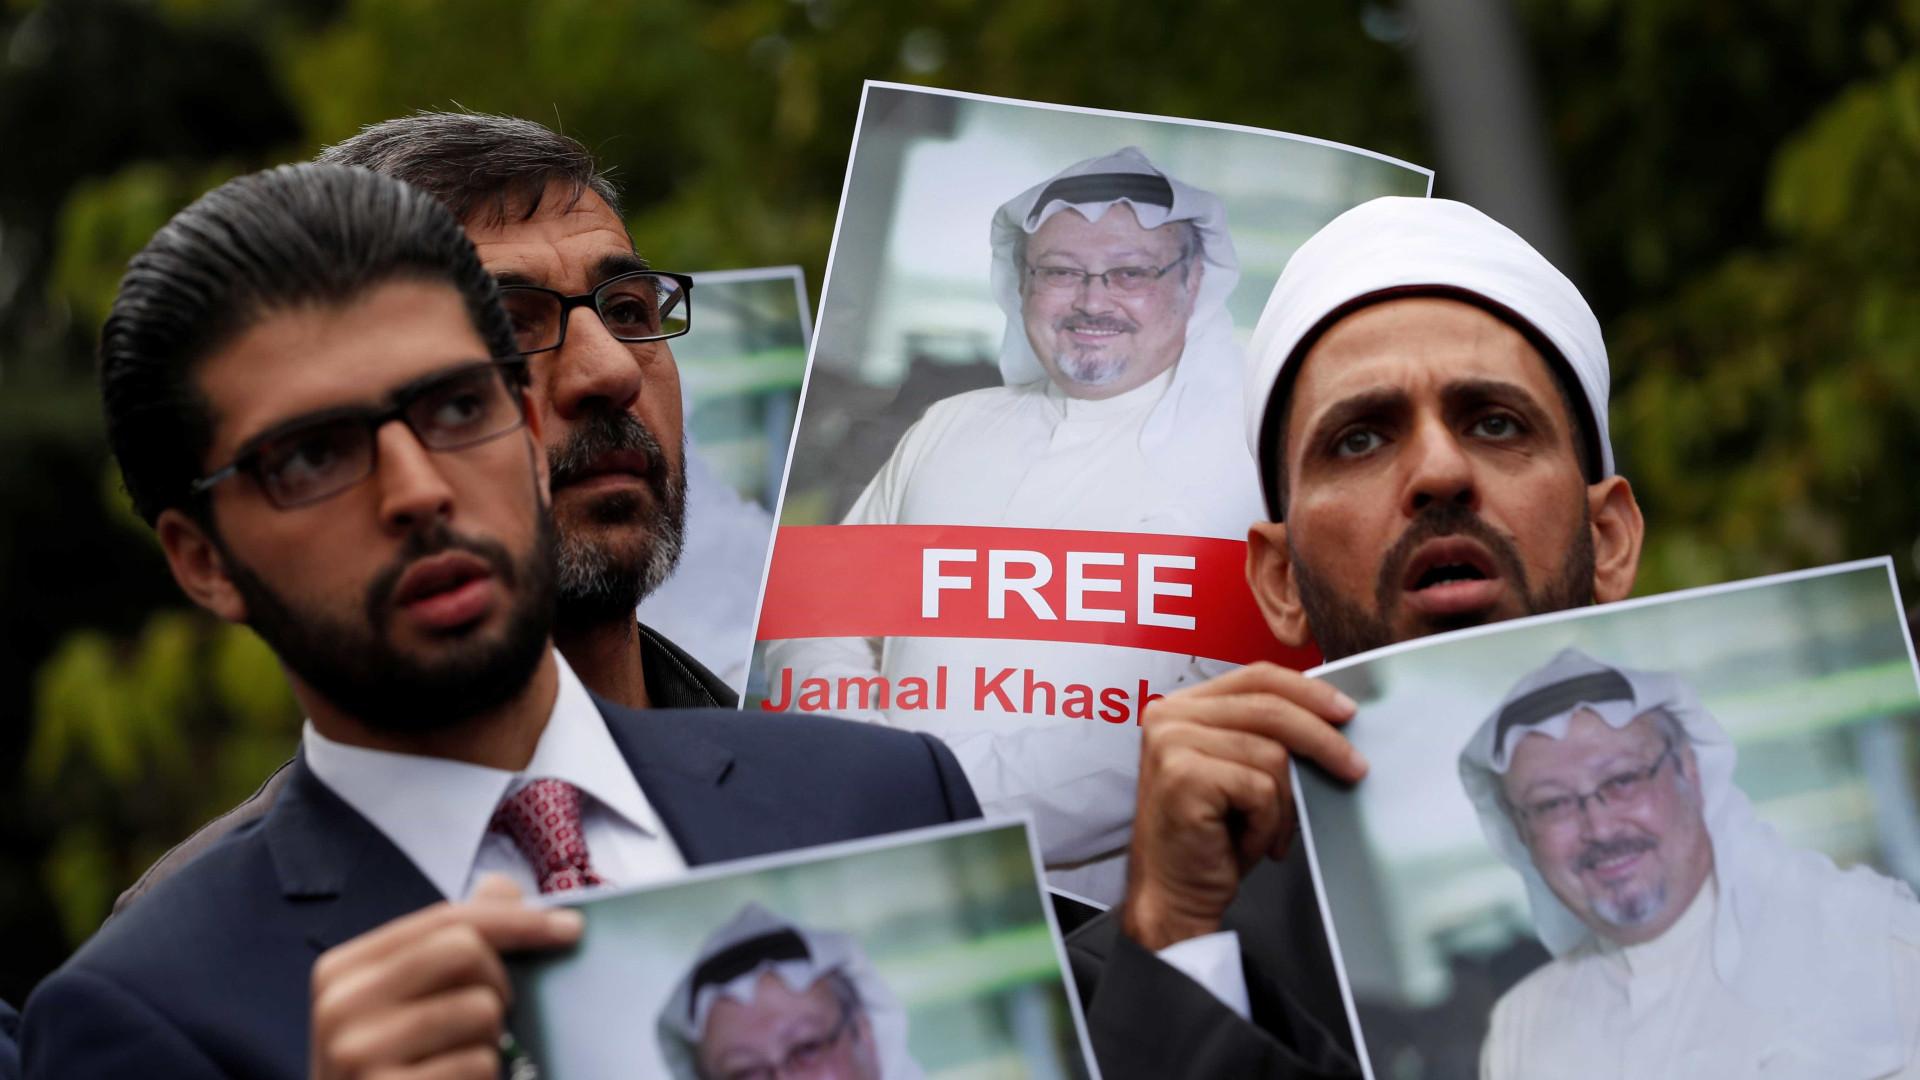 Jornalista saudita foi 'desmembrado' na Turquia, diz 'NYT'